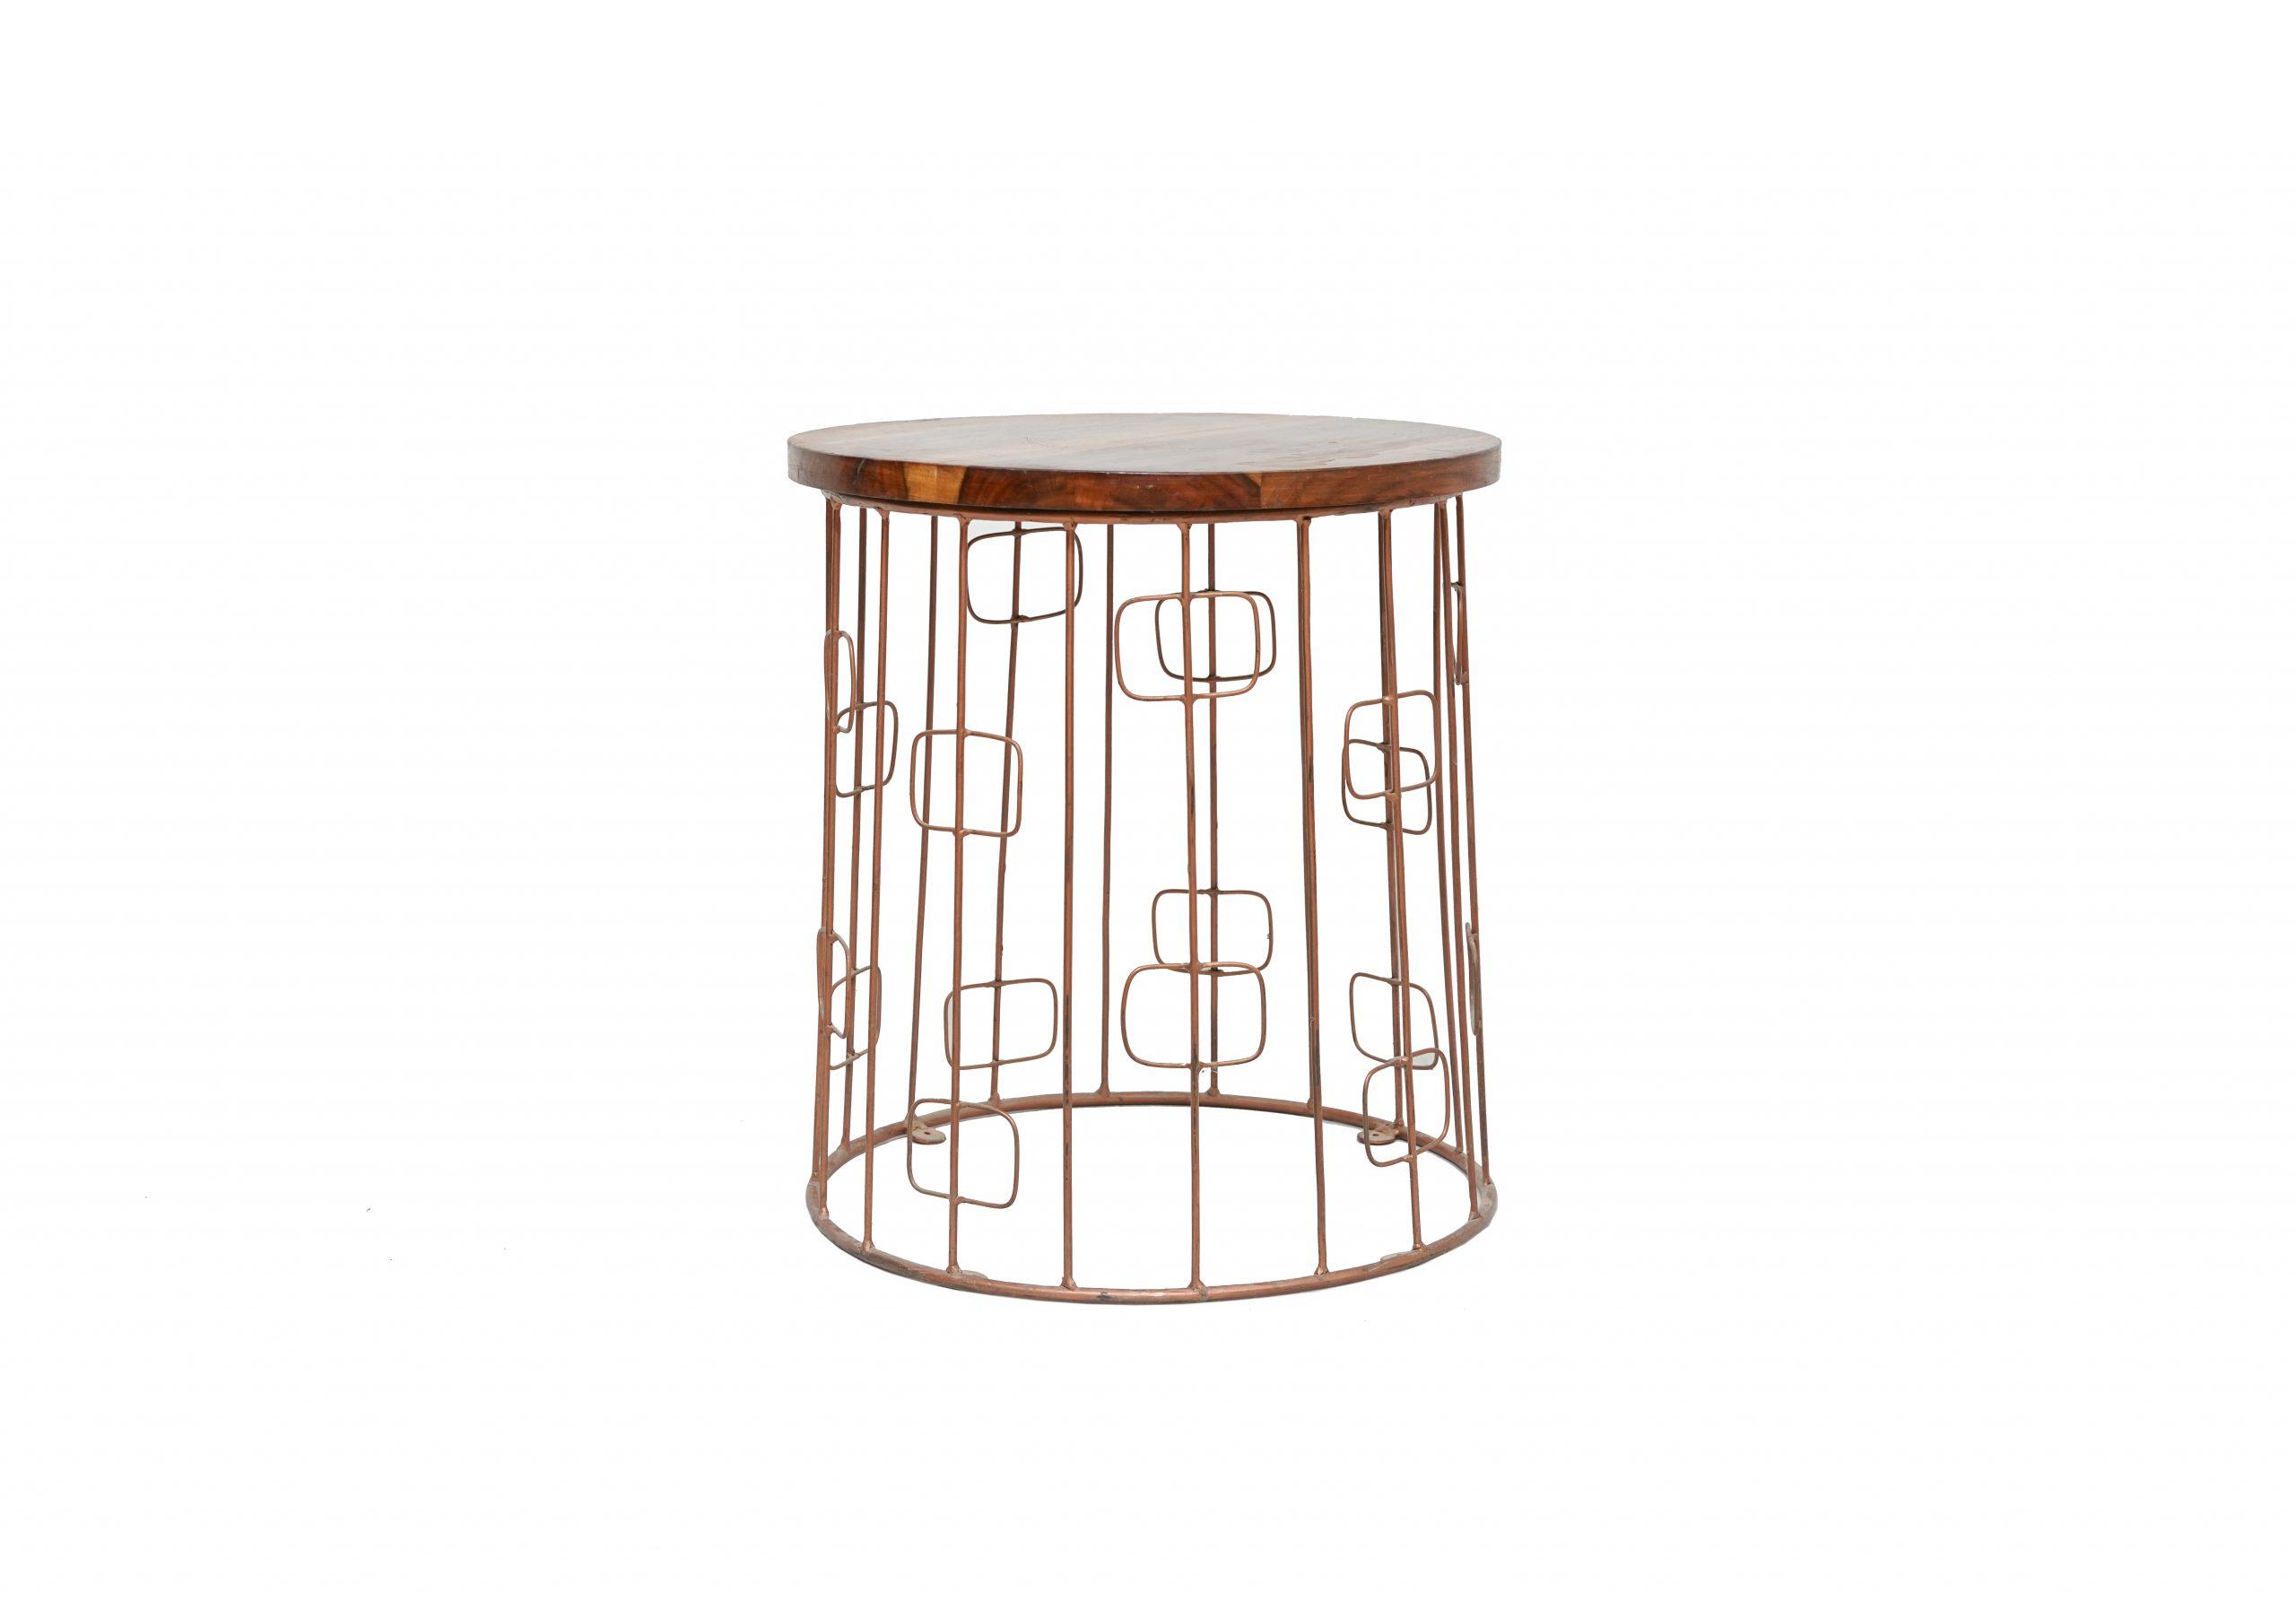 A bar stool